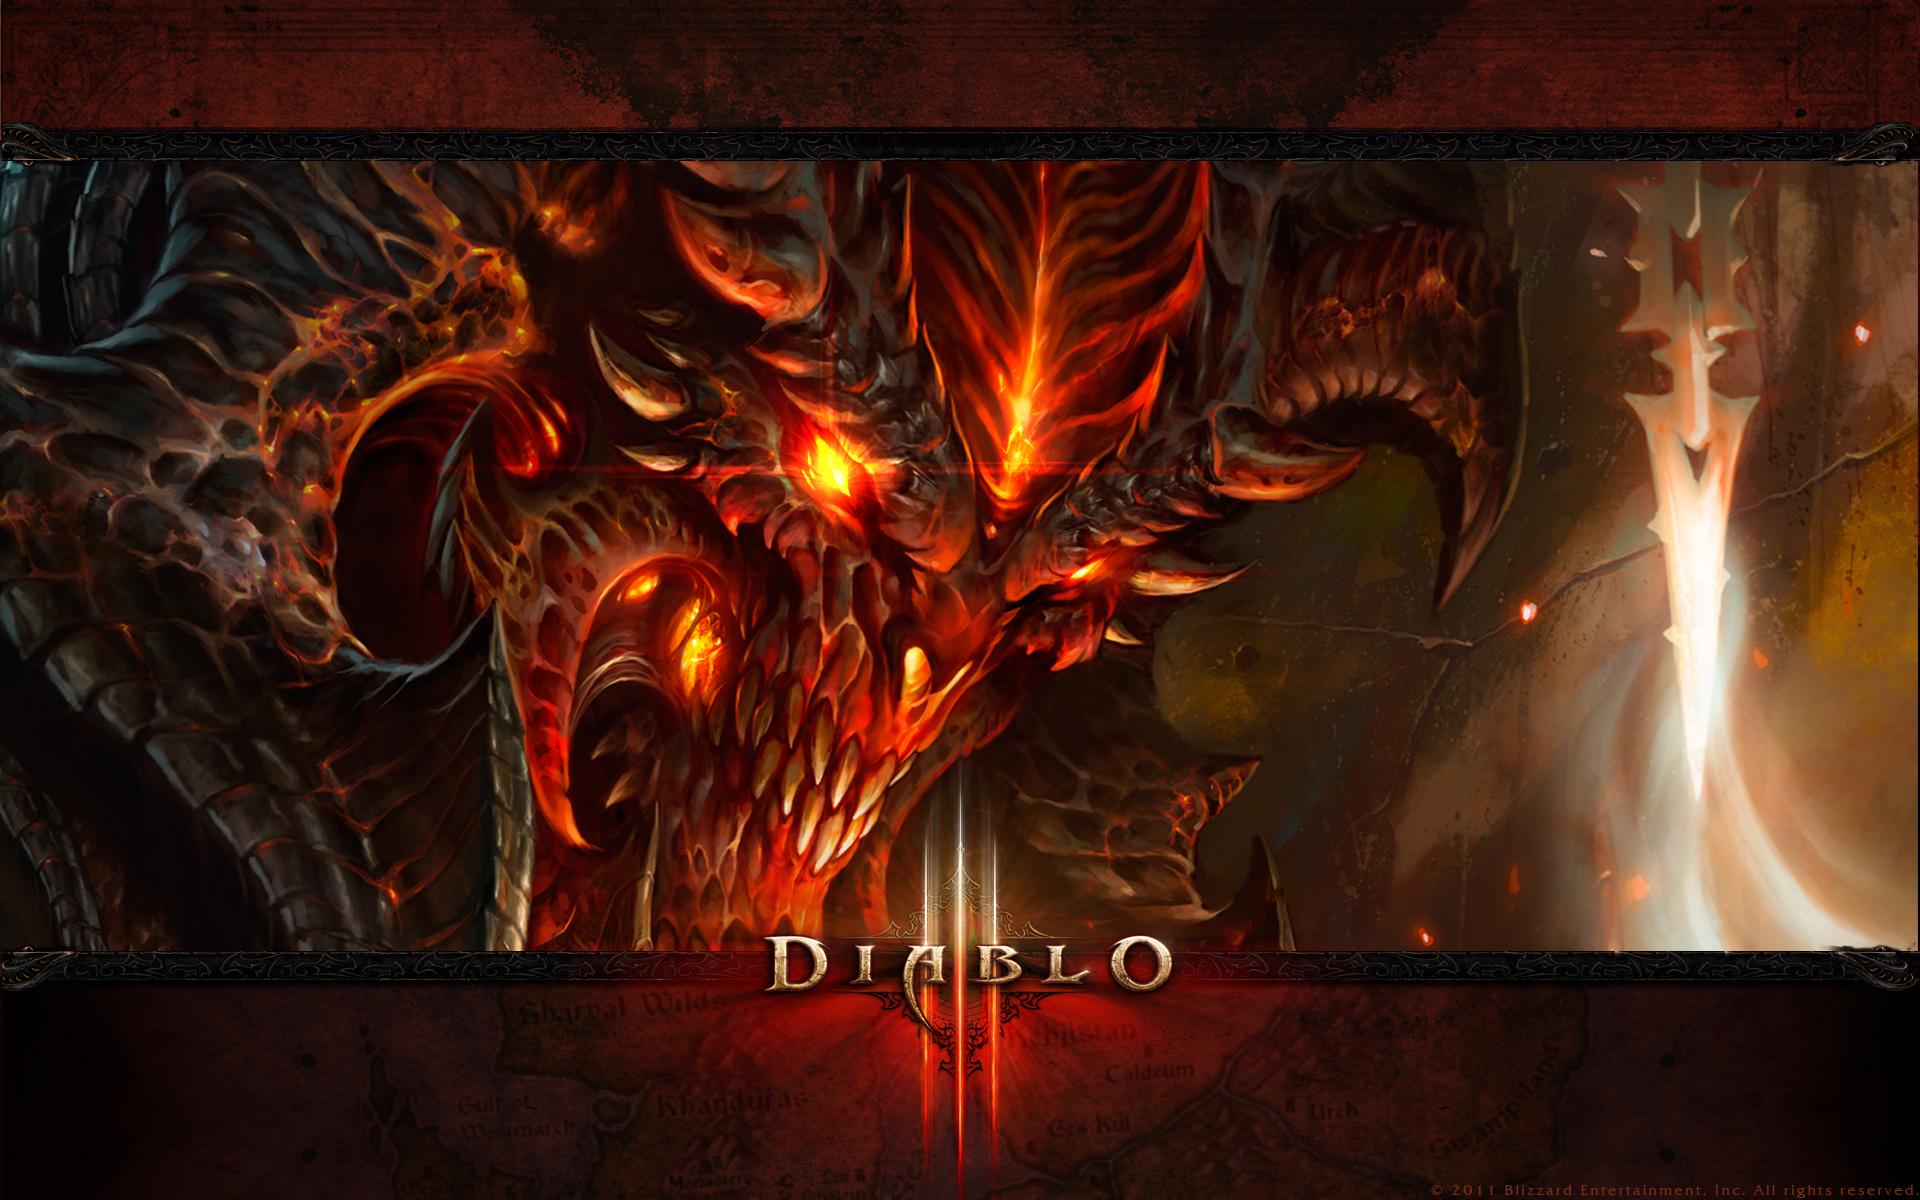 Diablo 3 Wallpaper Size 1920 1200 pixels 1920x1200